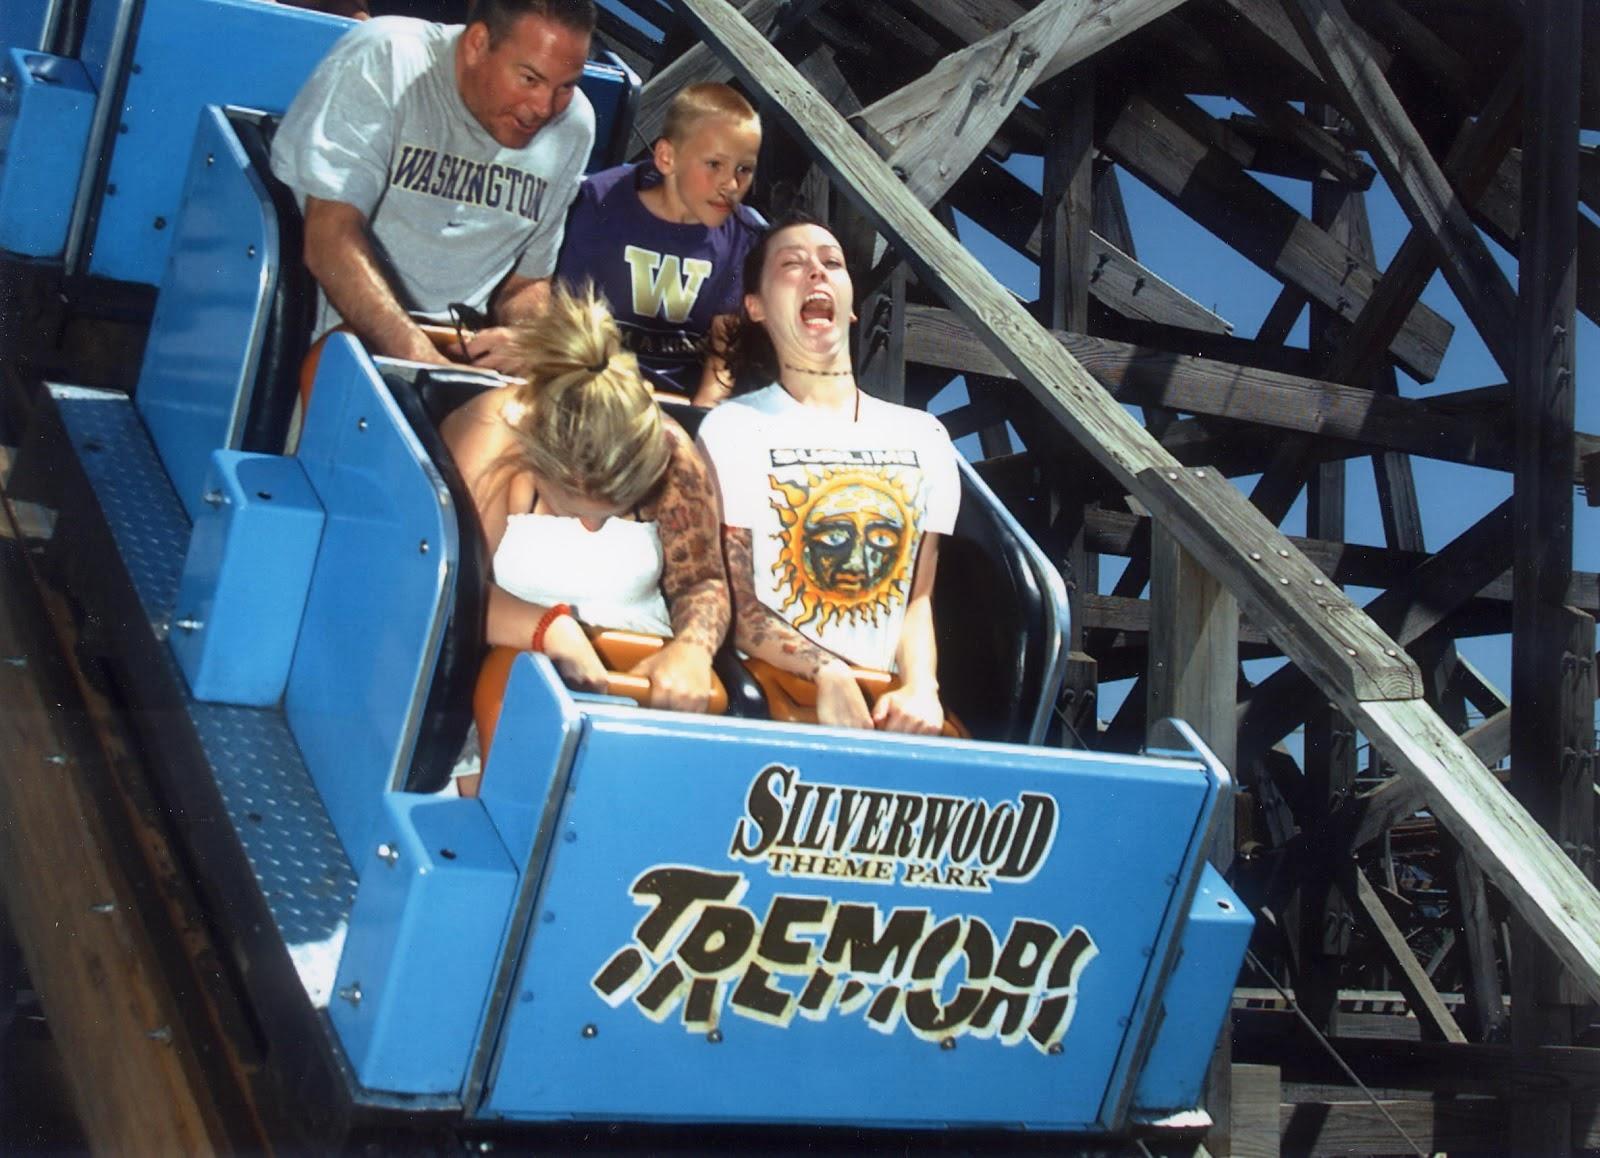 Kumpulan Gambar Muka Lucu Saat Naik Roller CoasterJago TawA